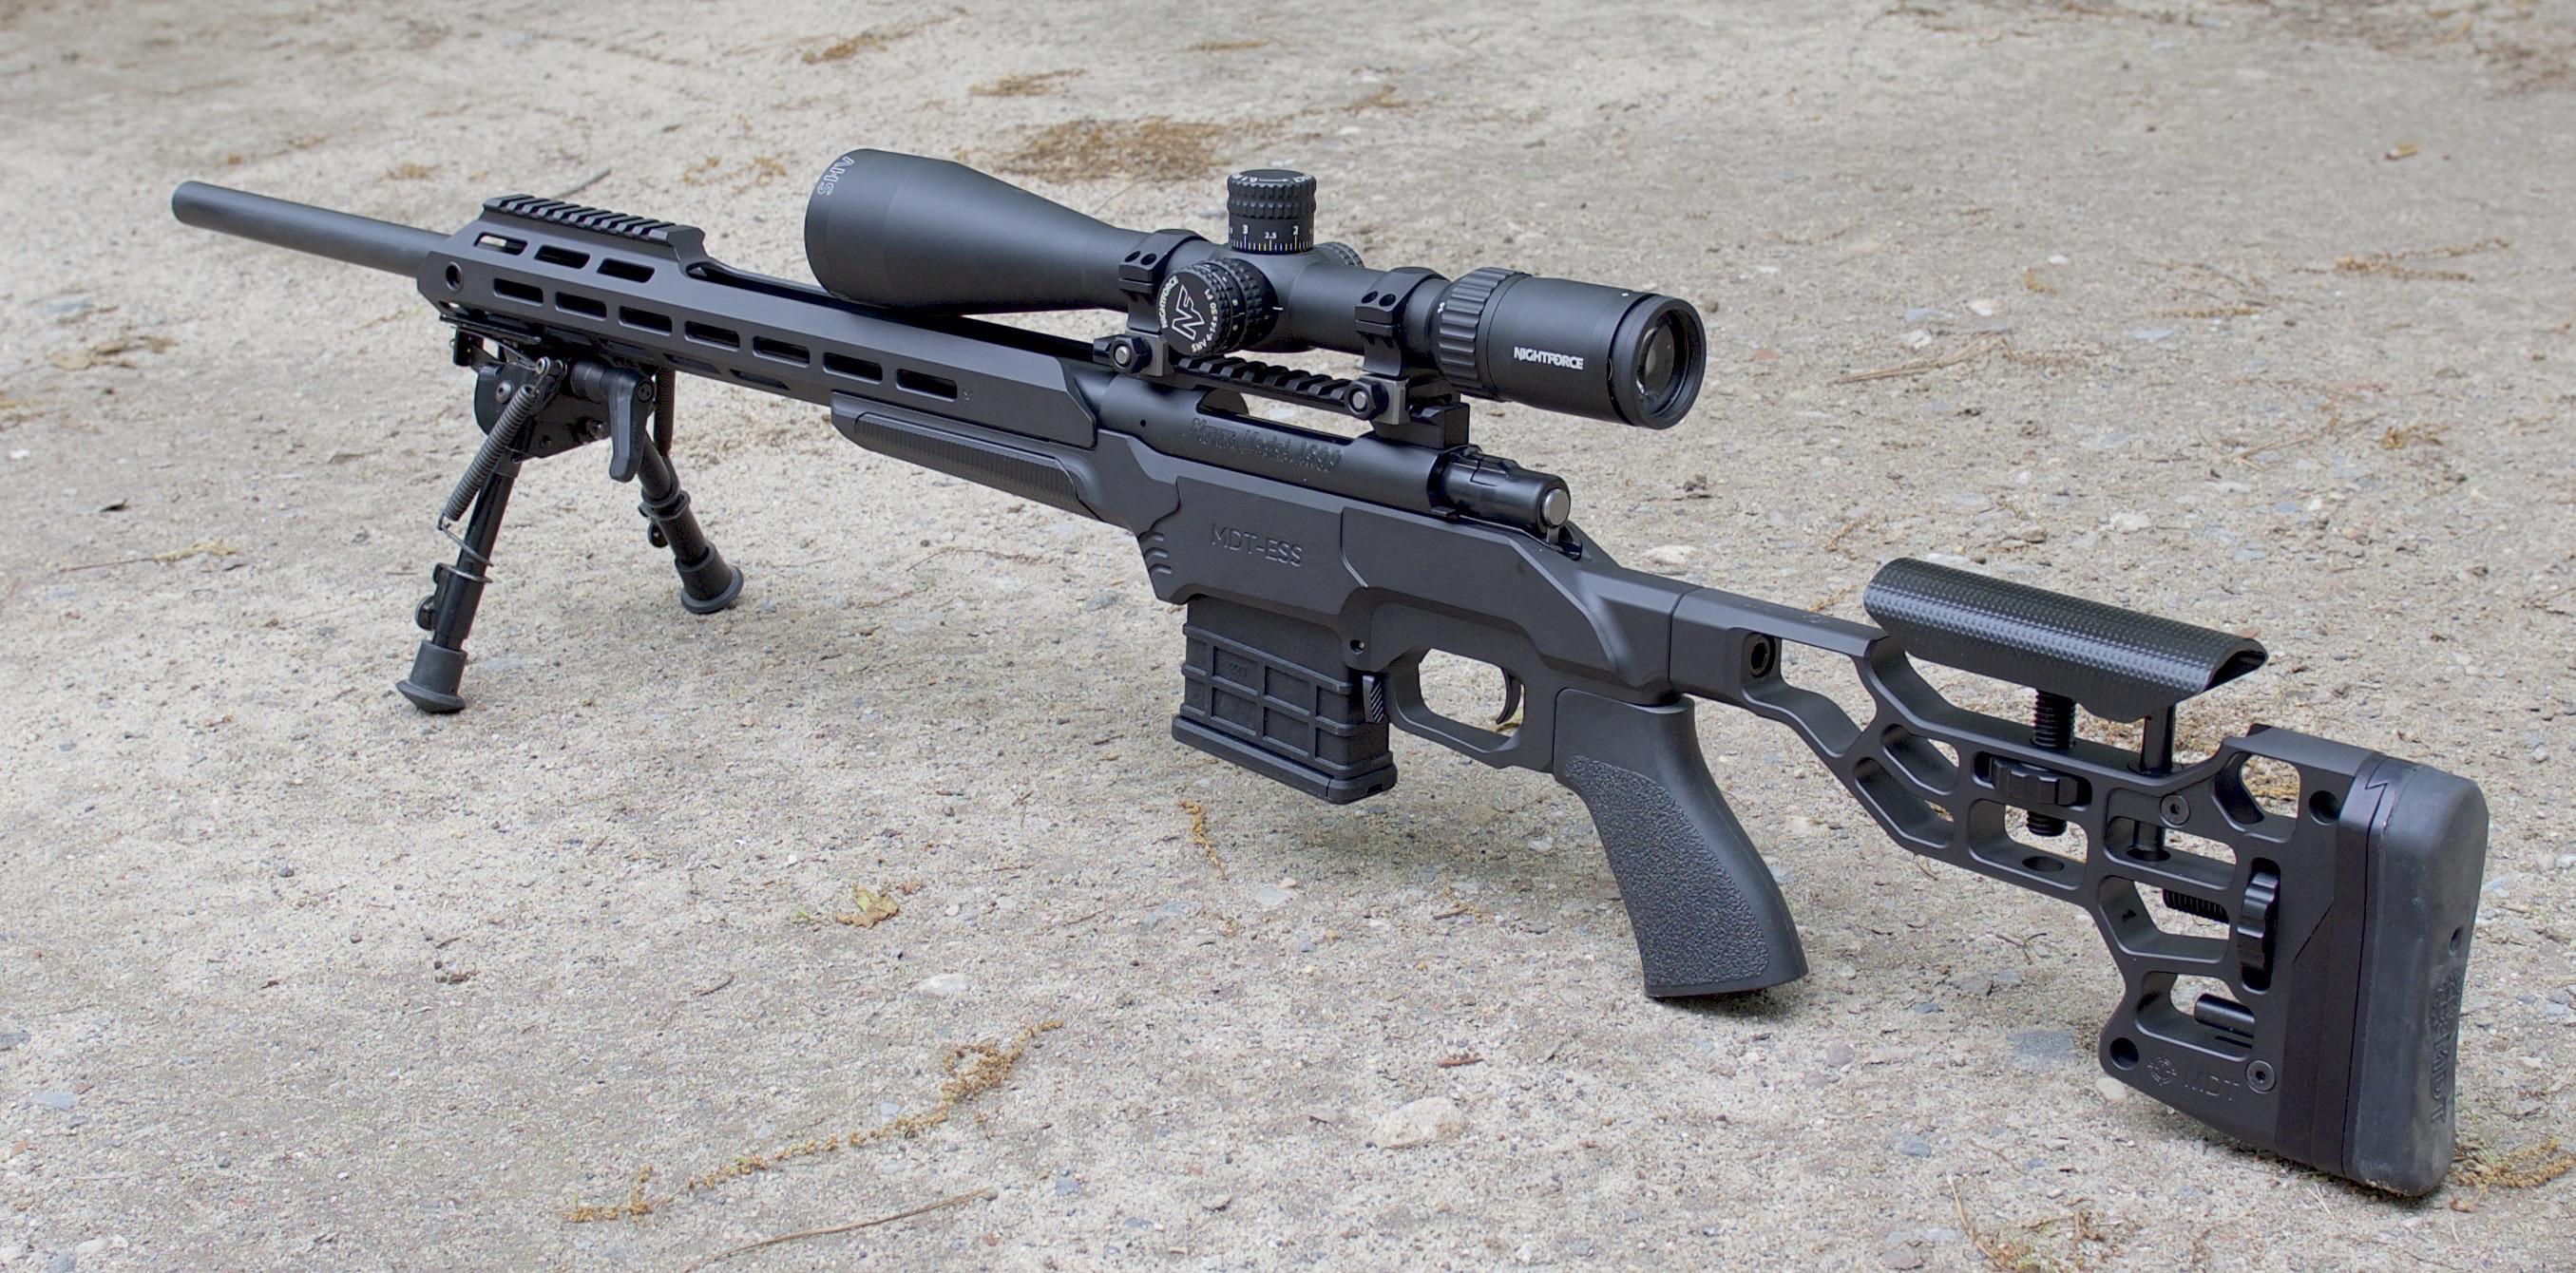 Howa Trigger Diagram Explained Wiring Diagrams Remington 700 Building A Custom 308 Winchester Precision Rifle 1500 Action Gun Barrel Barreled